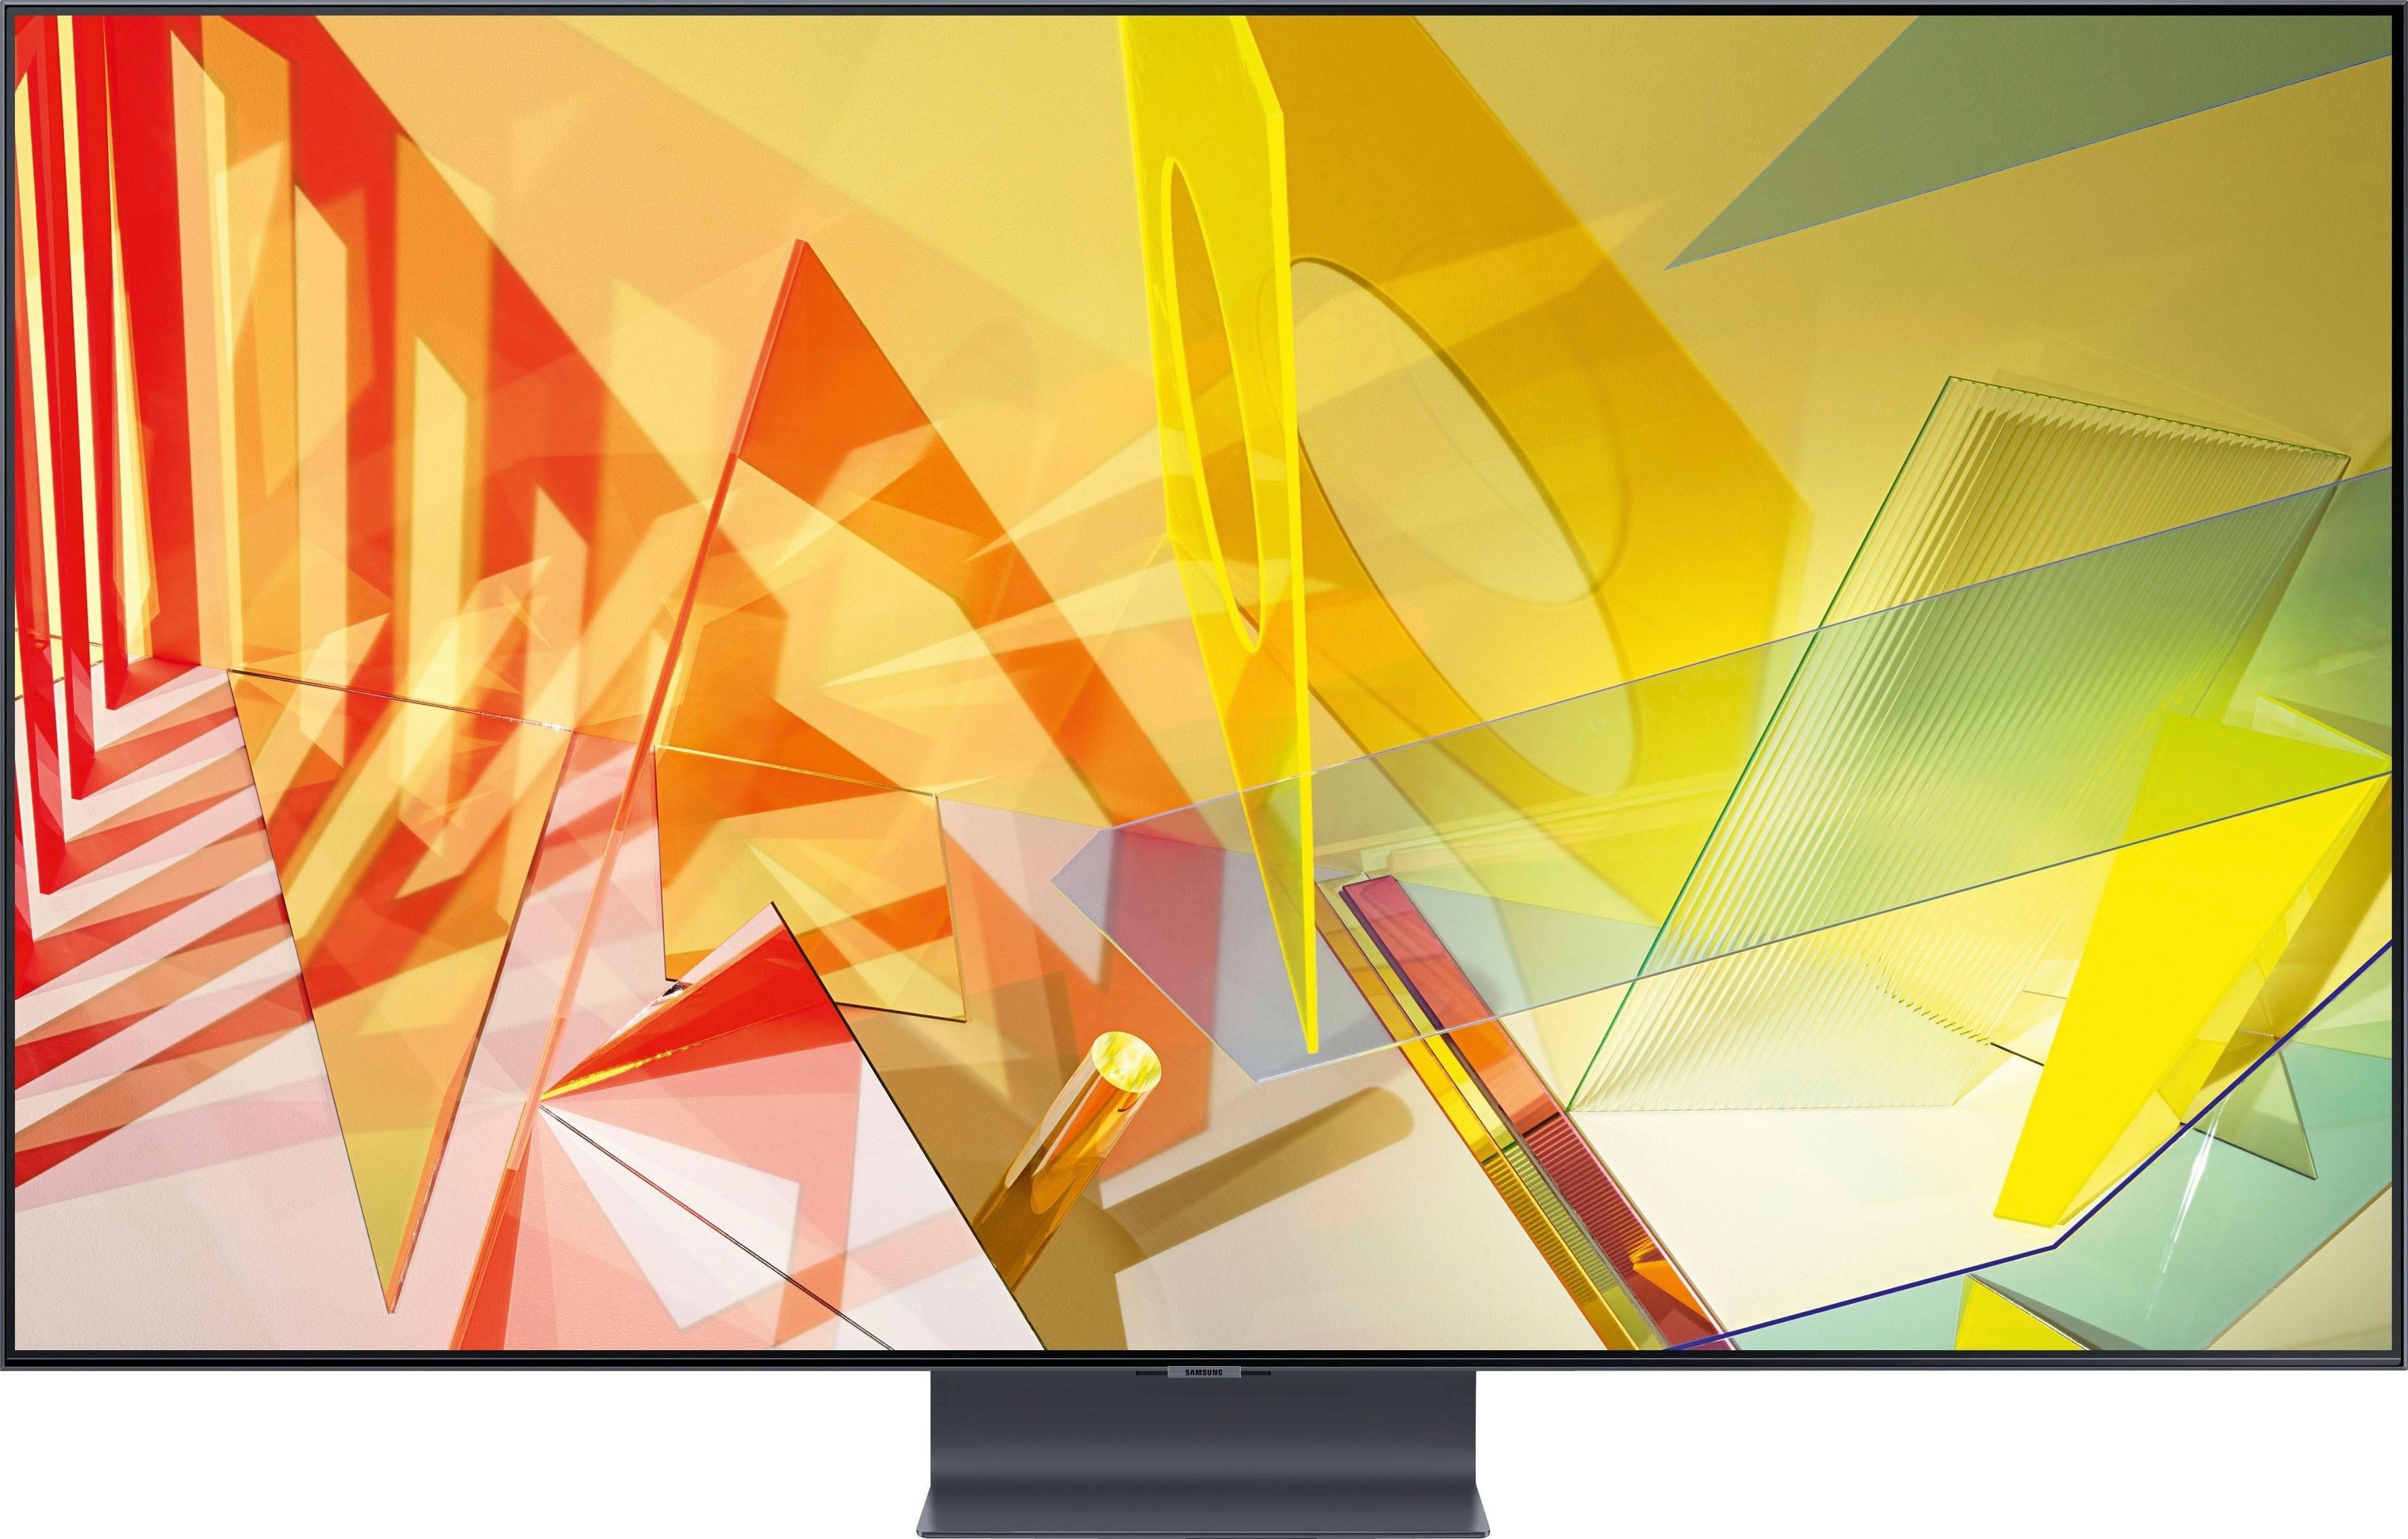 SAMSUNG GQ75Q95T QLED-televisie (189 cm / (75 Inch), 4K Ultra HD, Smart-TV bestellen: 30 dagen bedenktijd